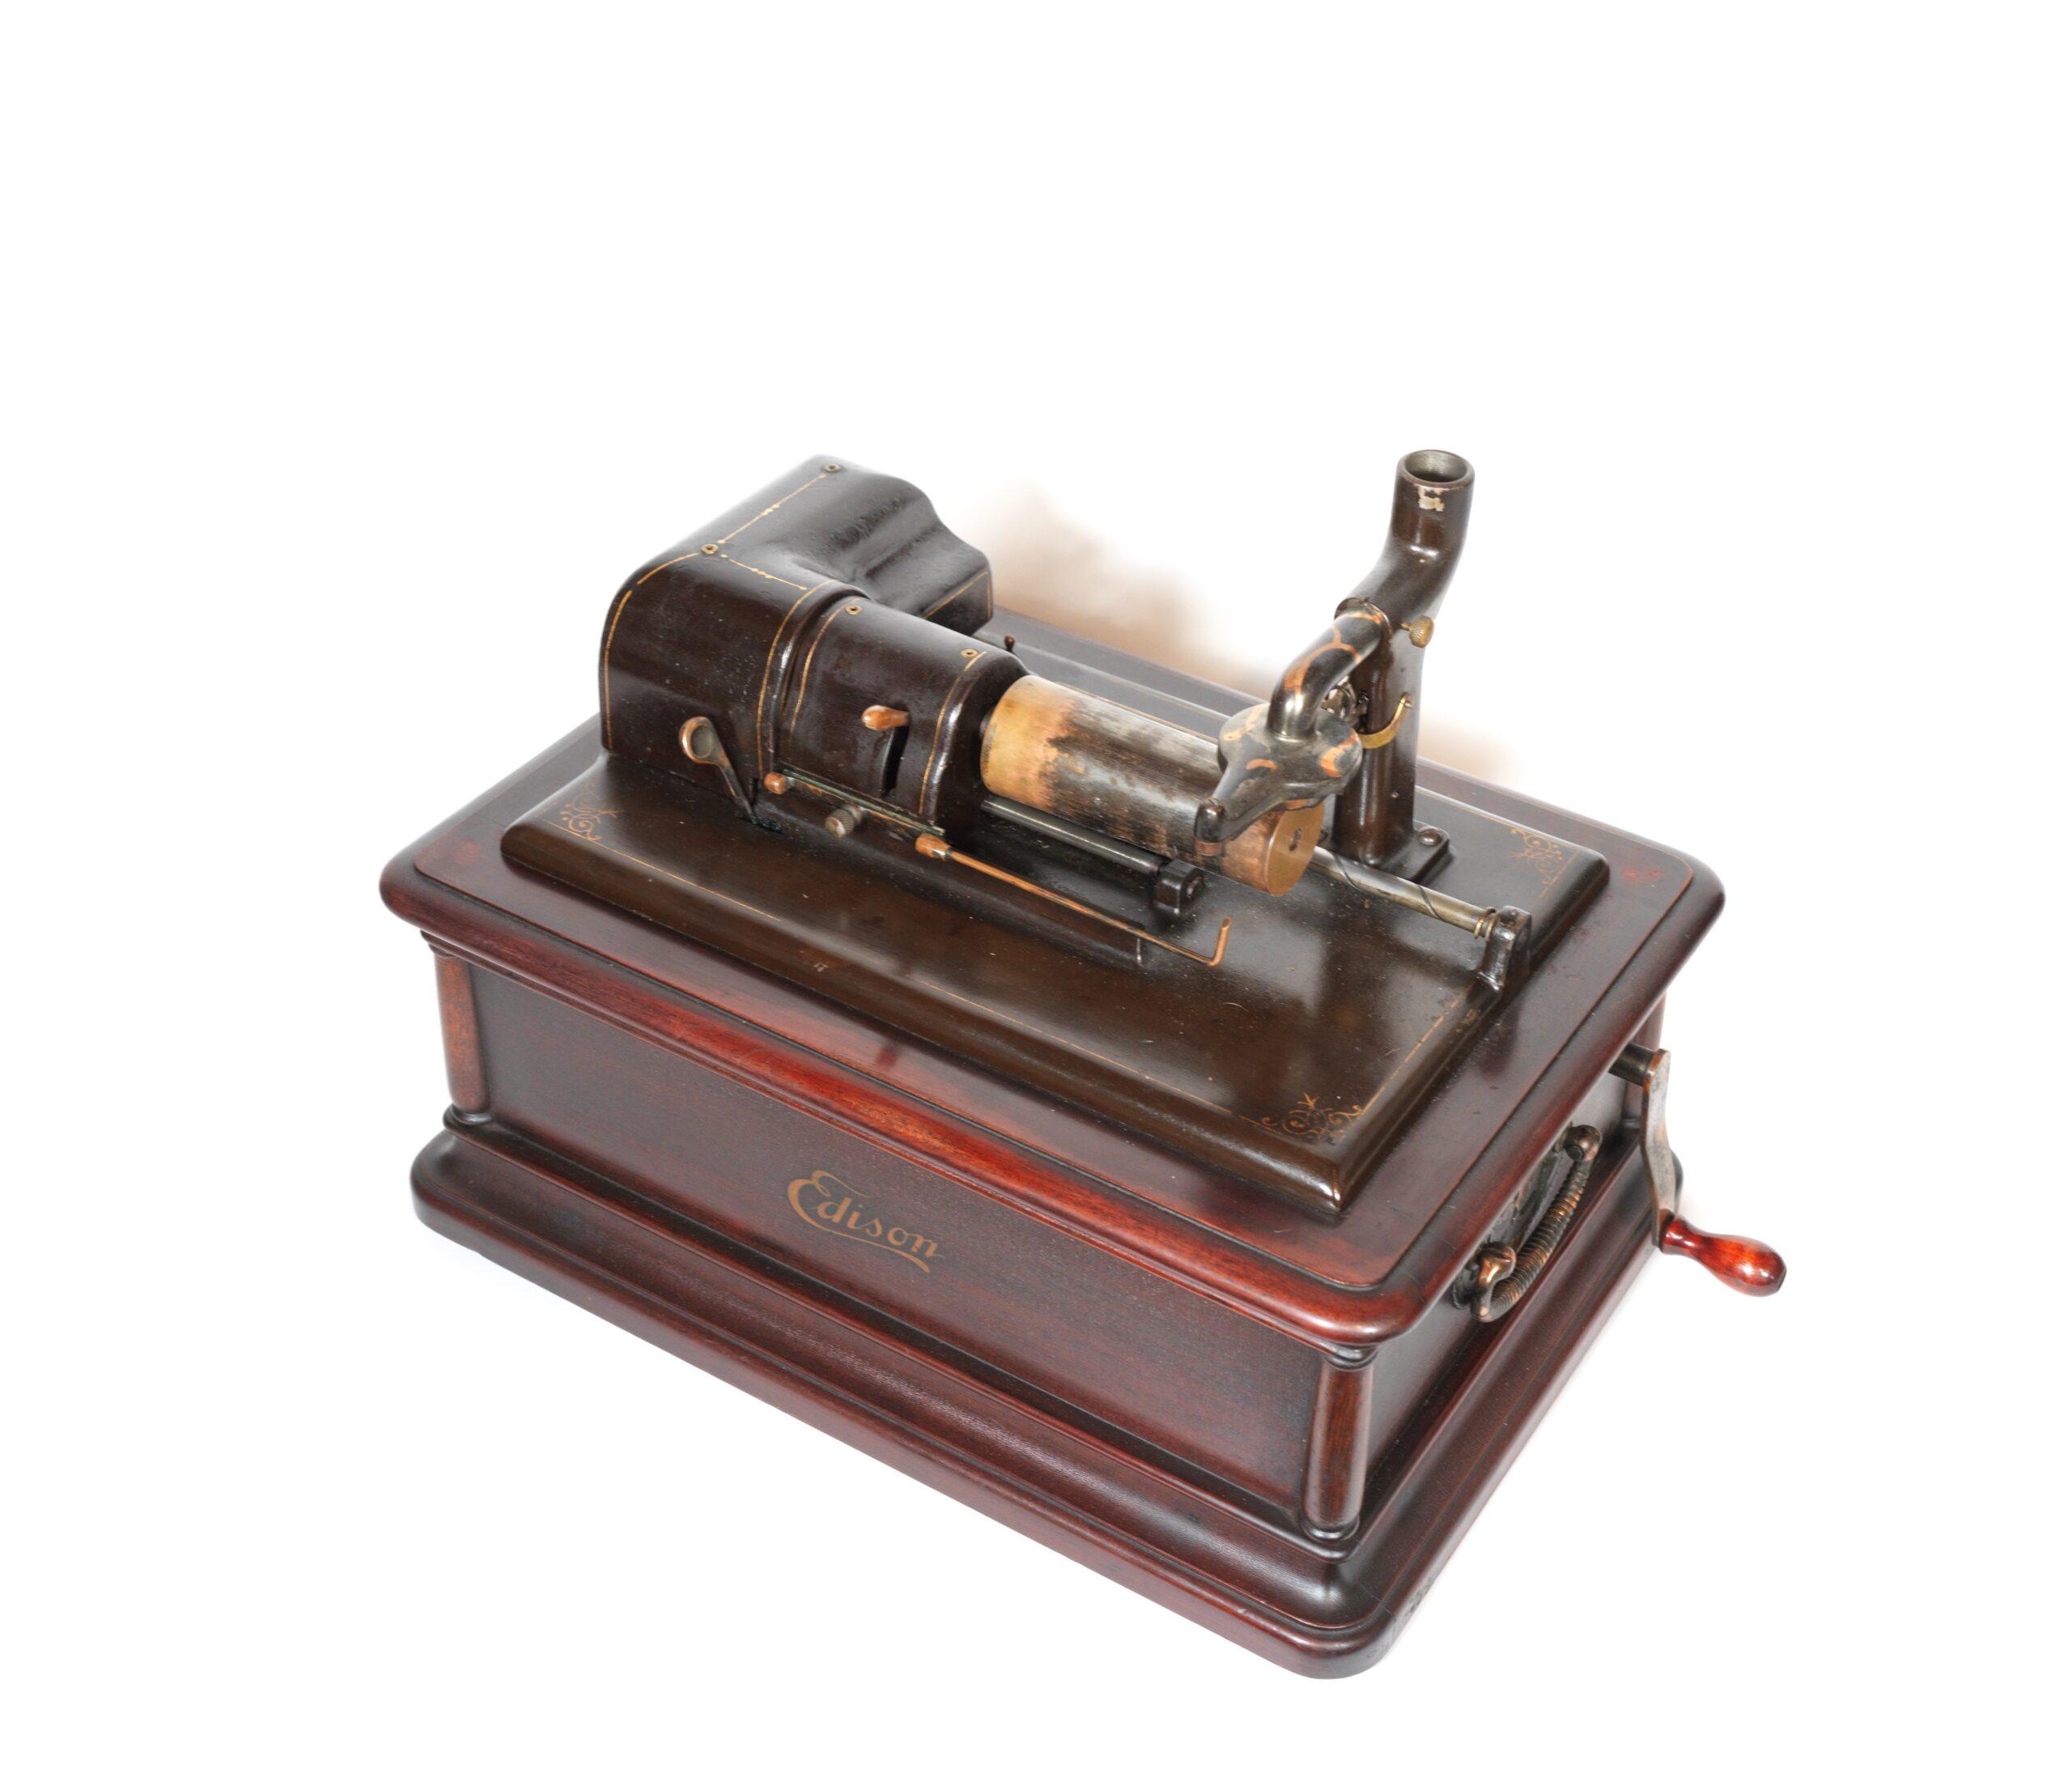 1912 Edison Opera Cylinder Phonograph